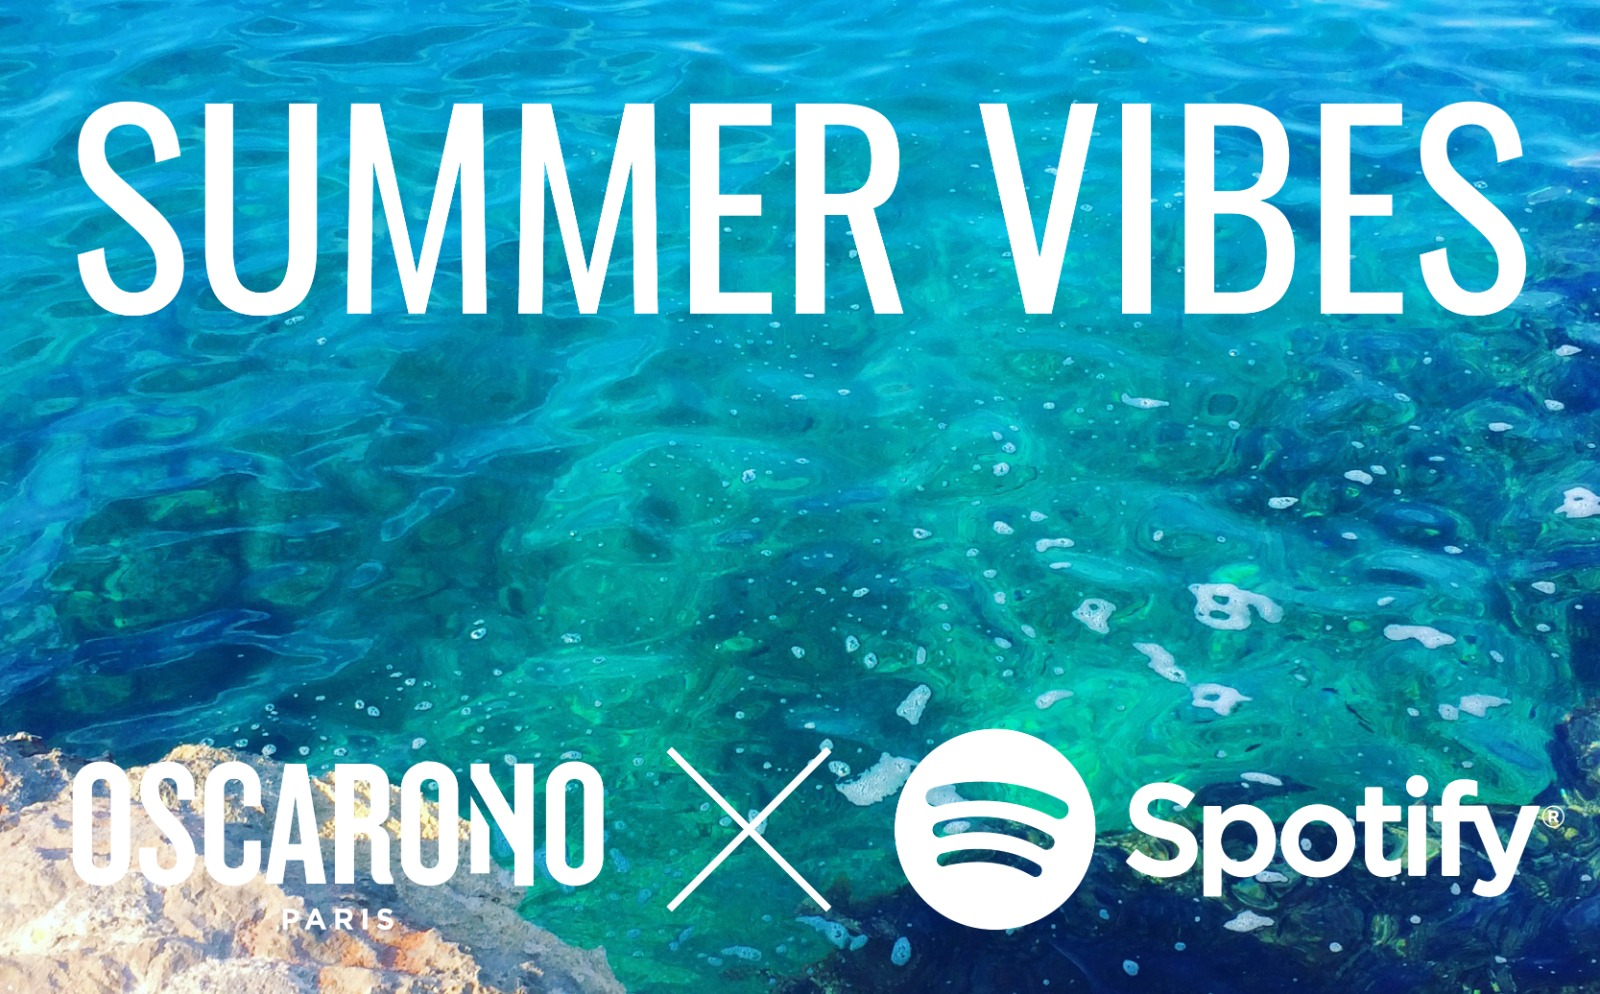 Sunny summer vibes - Oscar Ono X Spotify